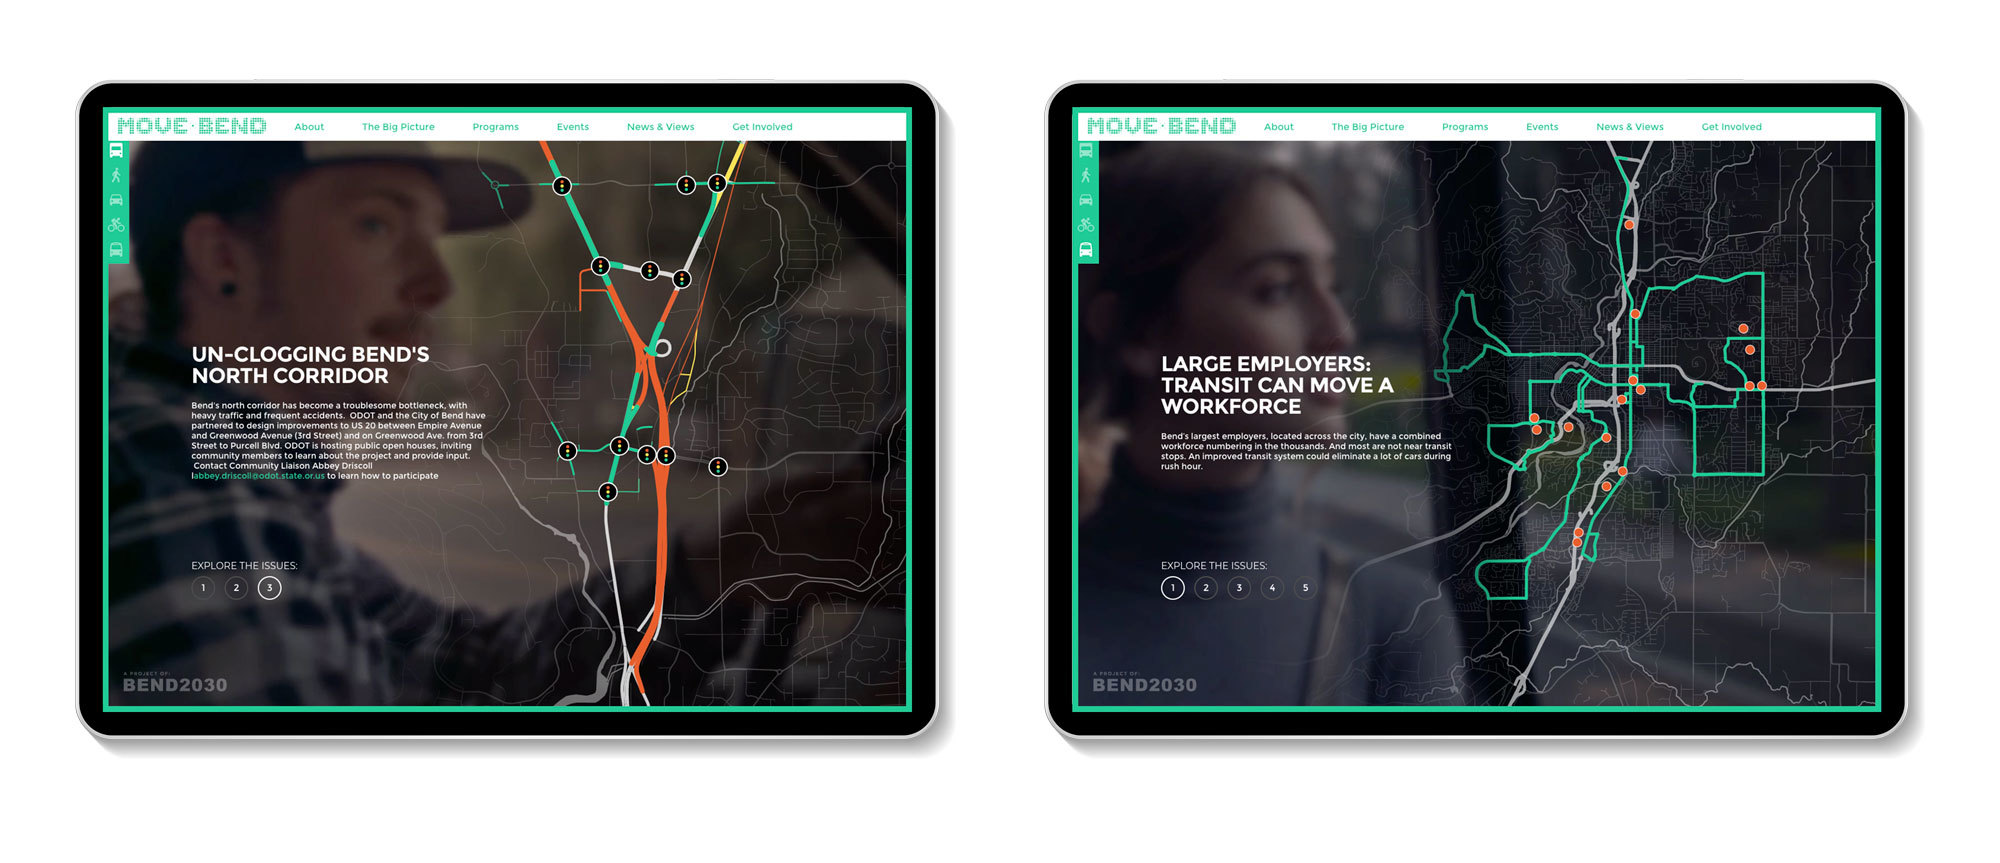 Move Bend transportation information maps